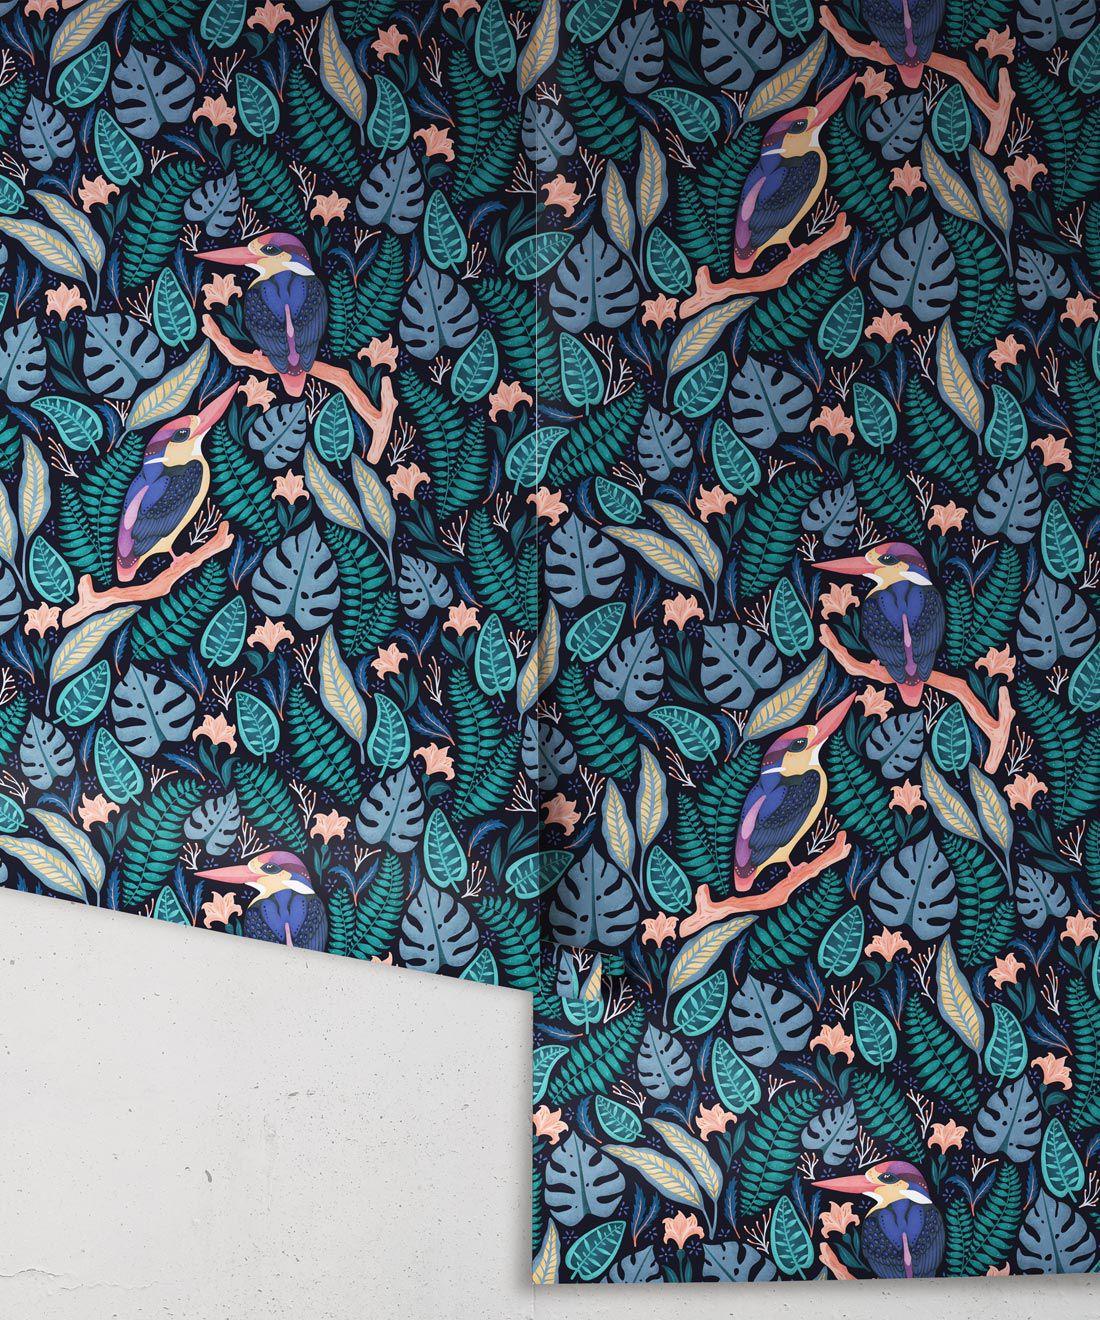 Kingfisher Wallpaper • Bird Wallpaper • Dark Color Wallpaper Rolls